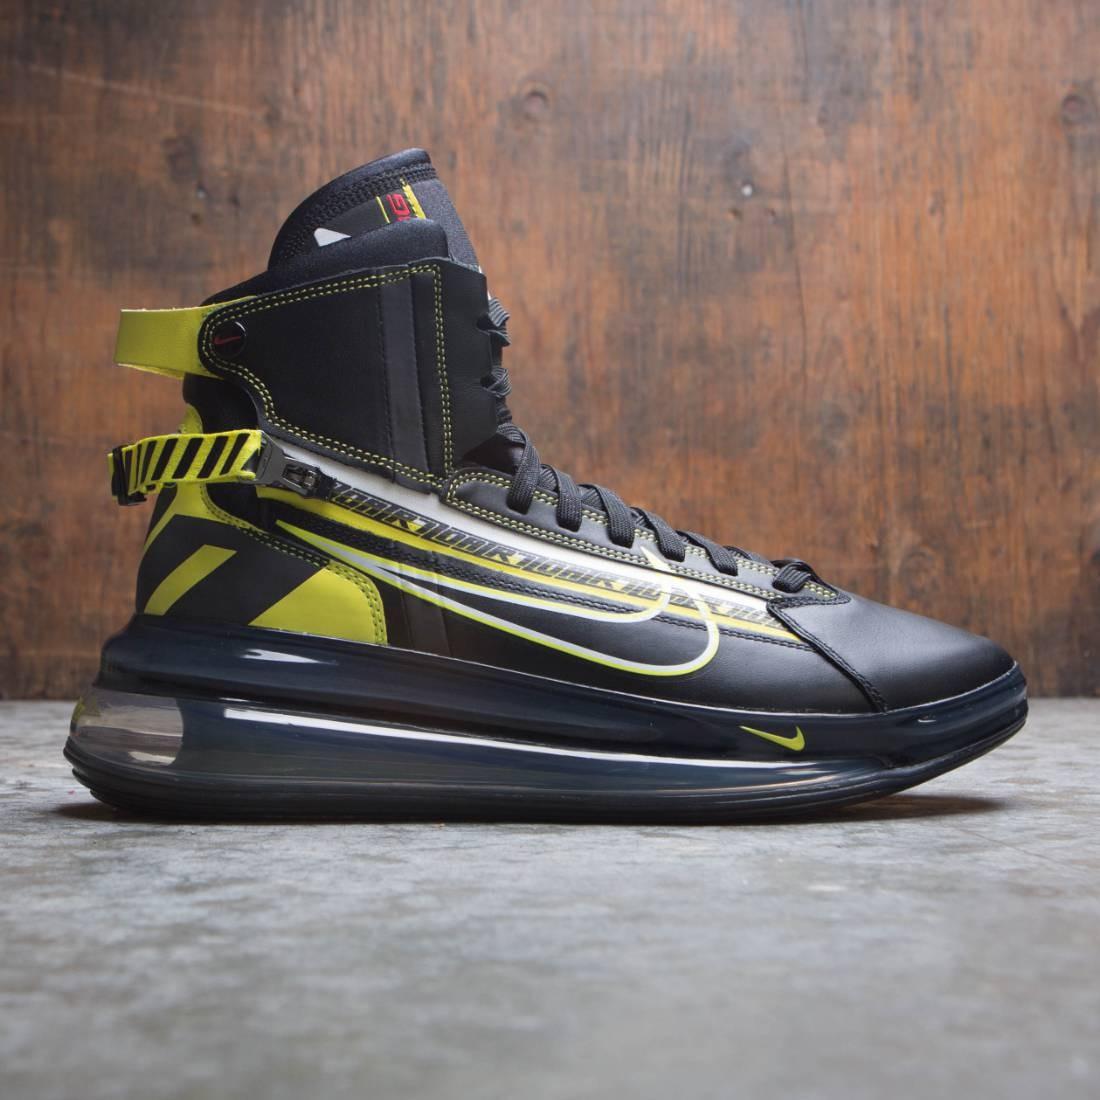 sneakers for cheap d71b3 8203f nike men air max 720 satrn qs black dynamic yellow university red